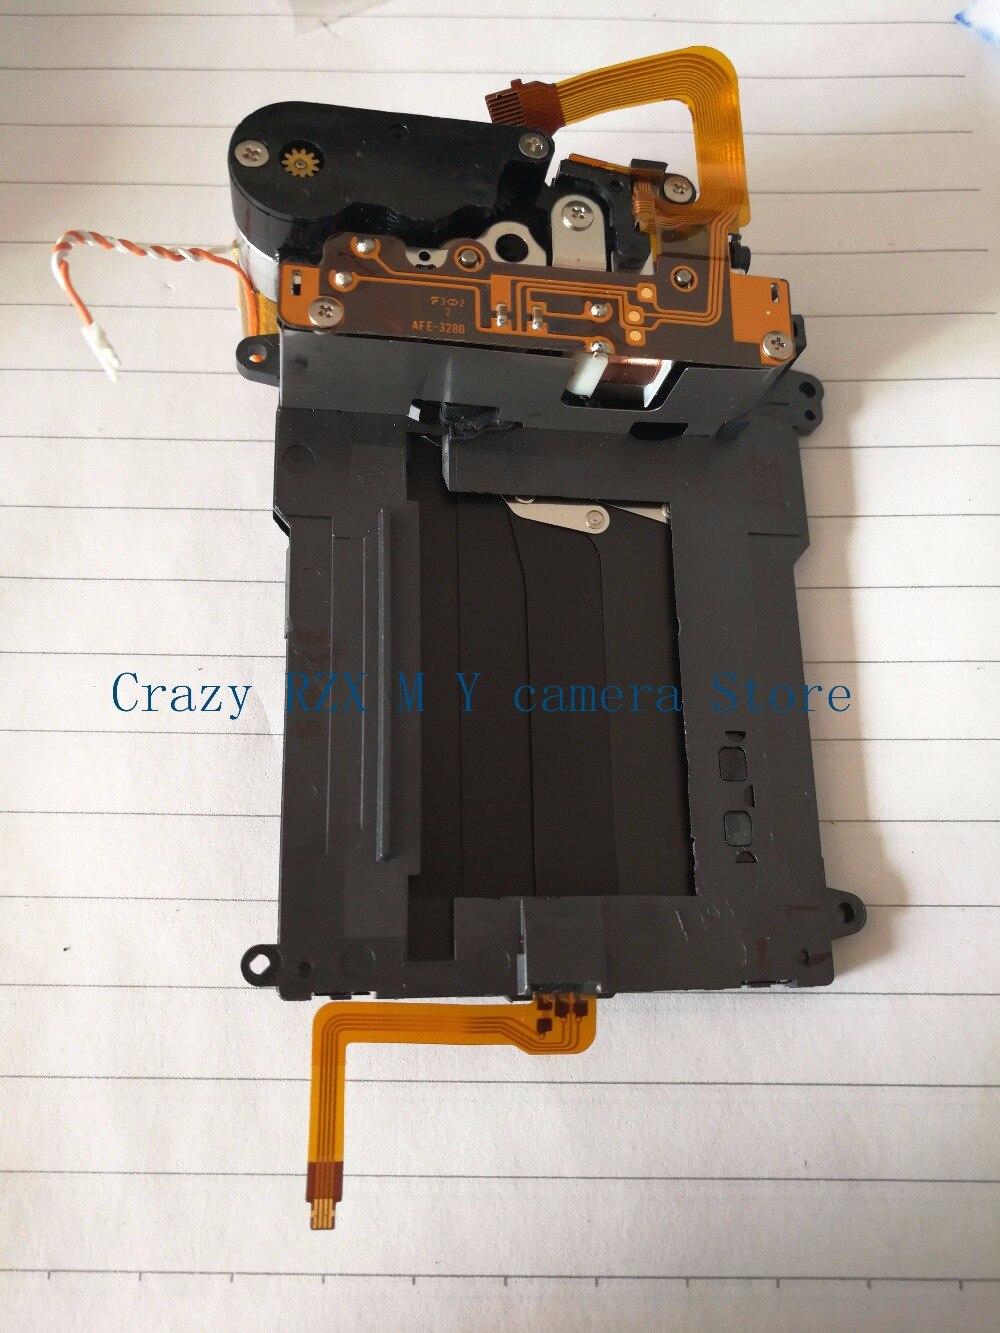 95% Original For Nikon D750 Shutter Blade Curtain Accessories Camera Replacement Unit Repair Parts